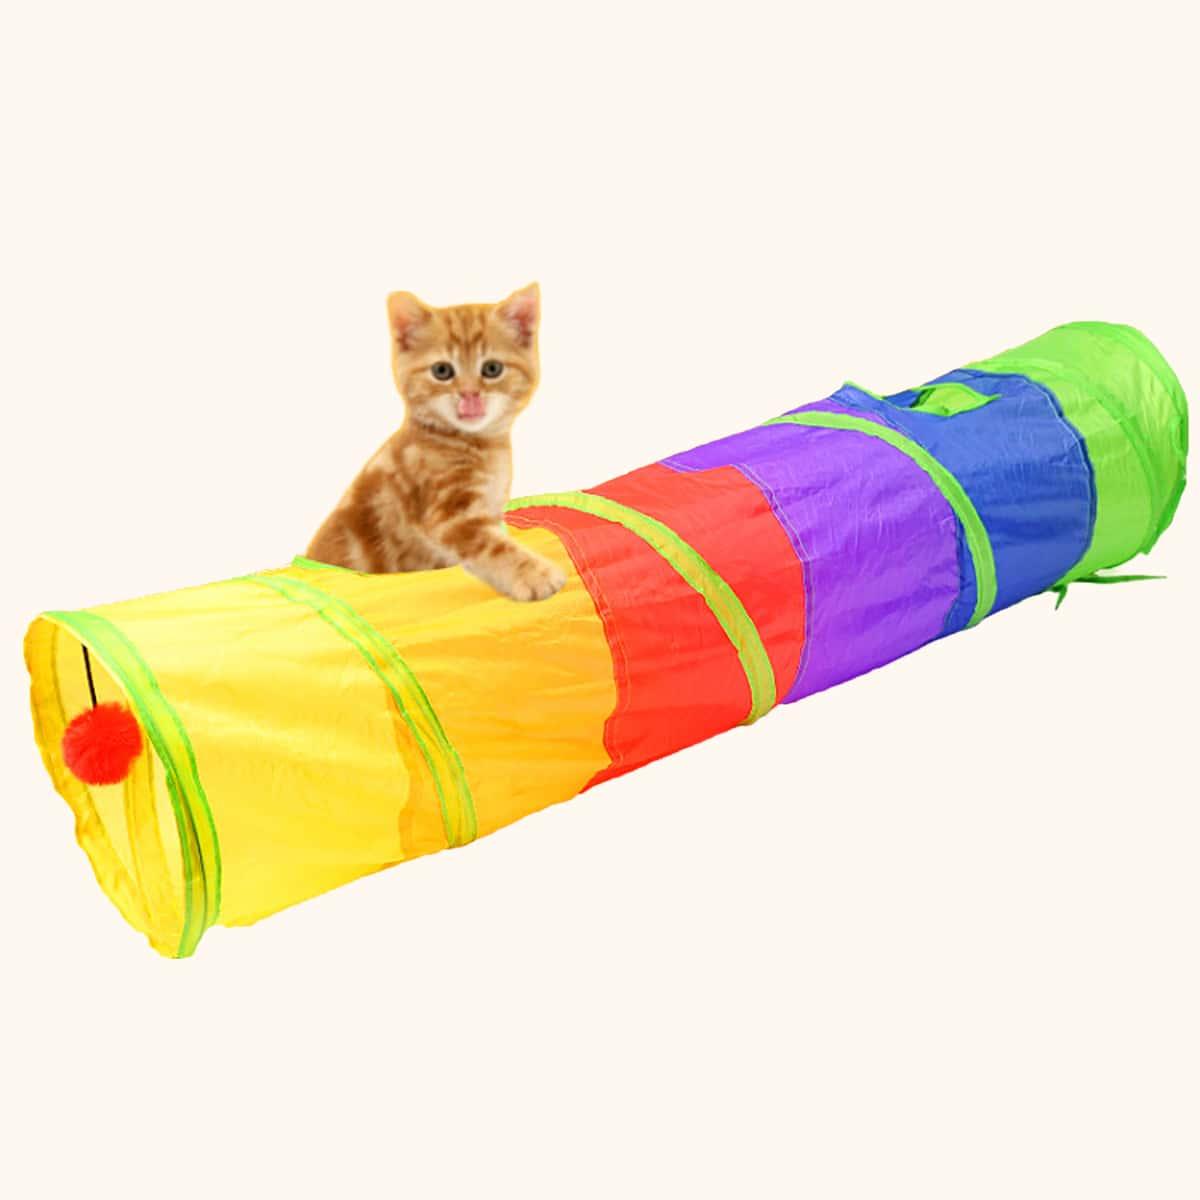 Katze buntes Tunnel Spielzeug